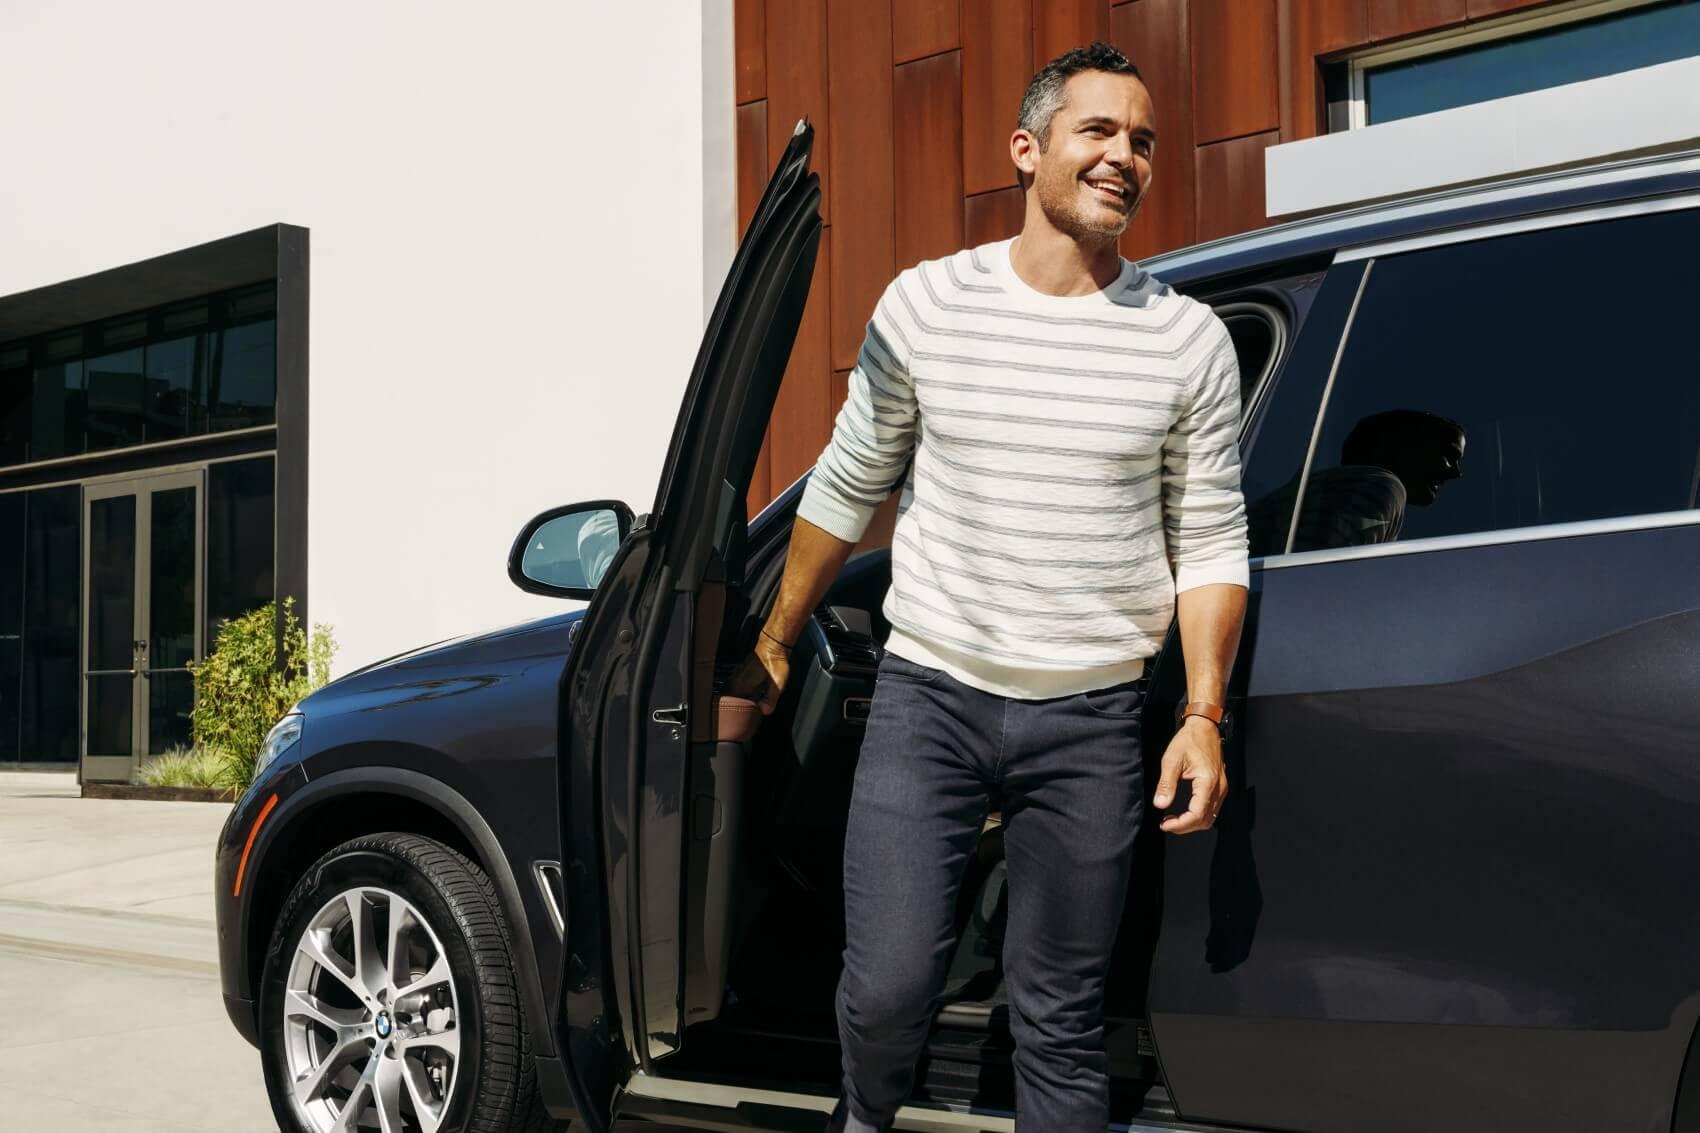 BMW X5 Interior Space & Amenities